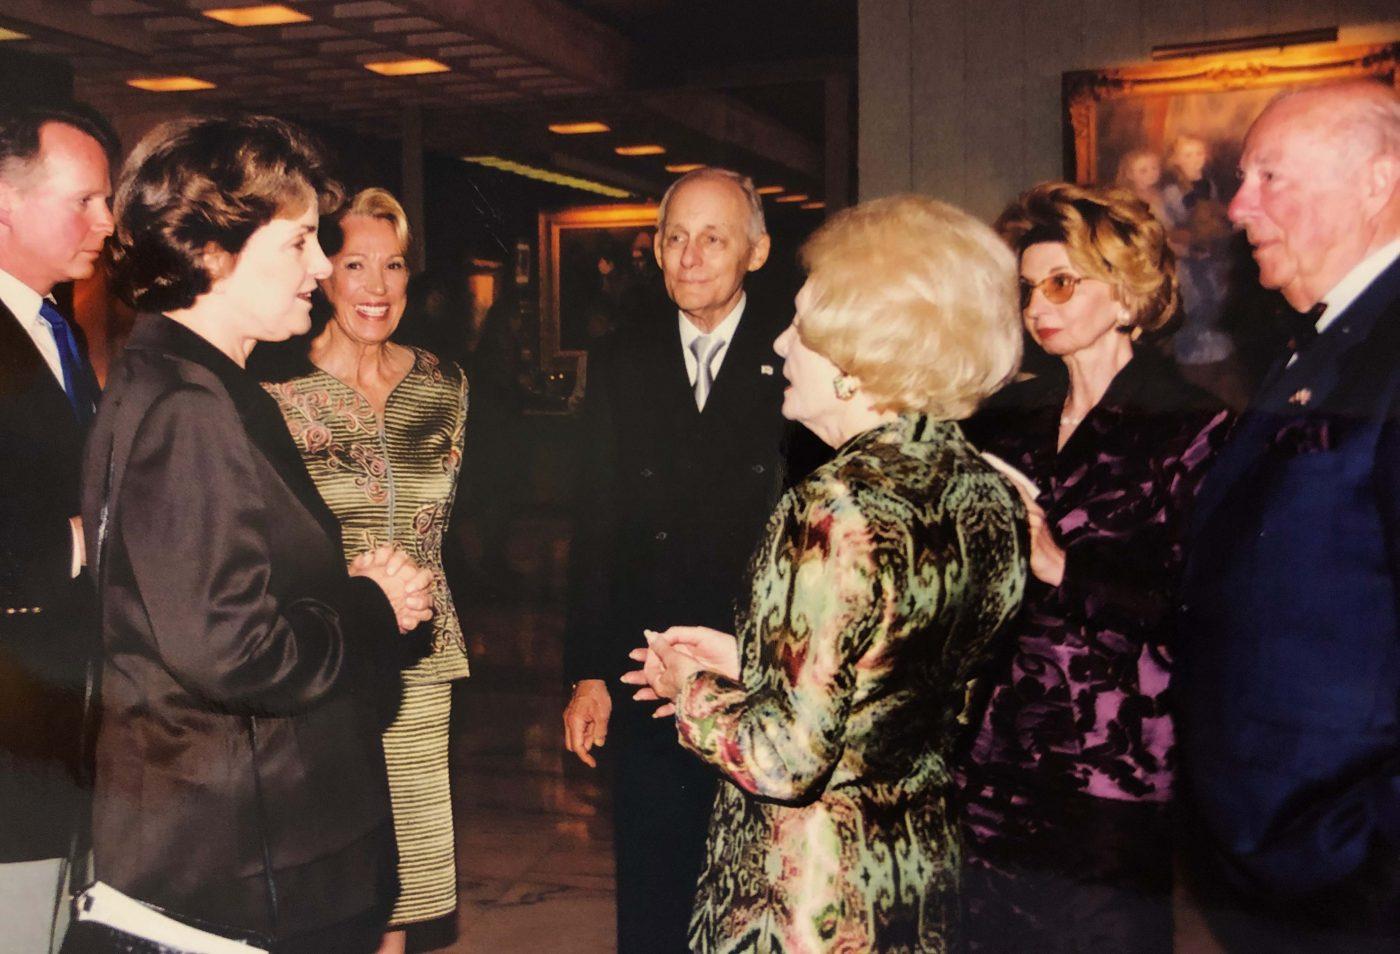 George Shultz and Leonore Annenberg